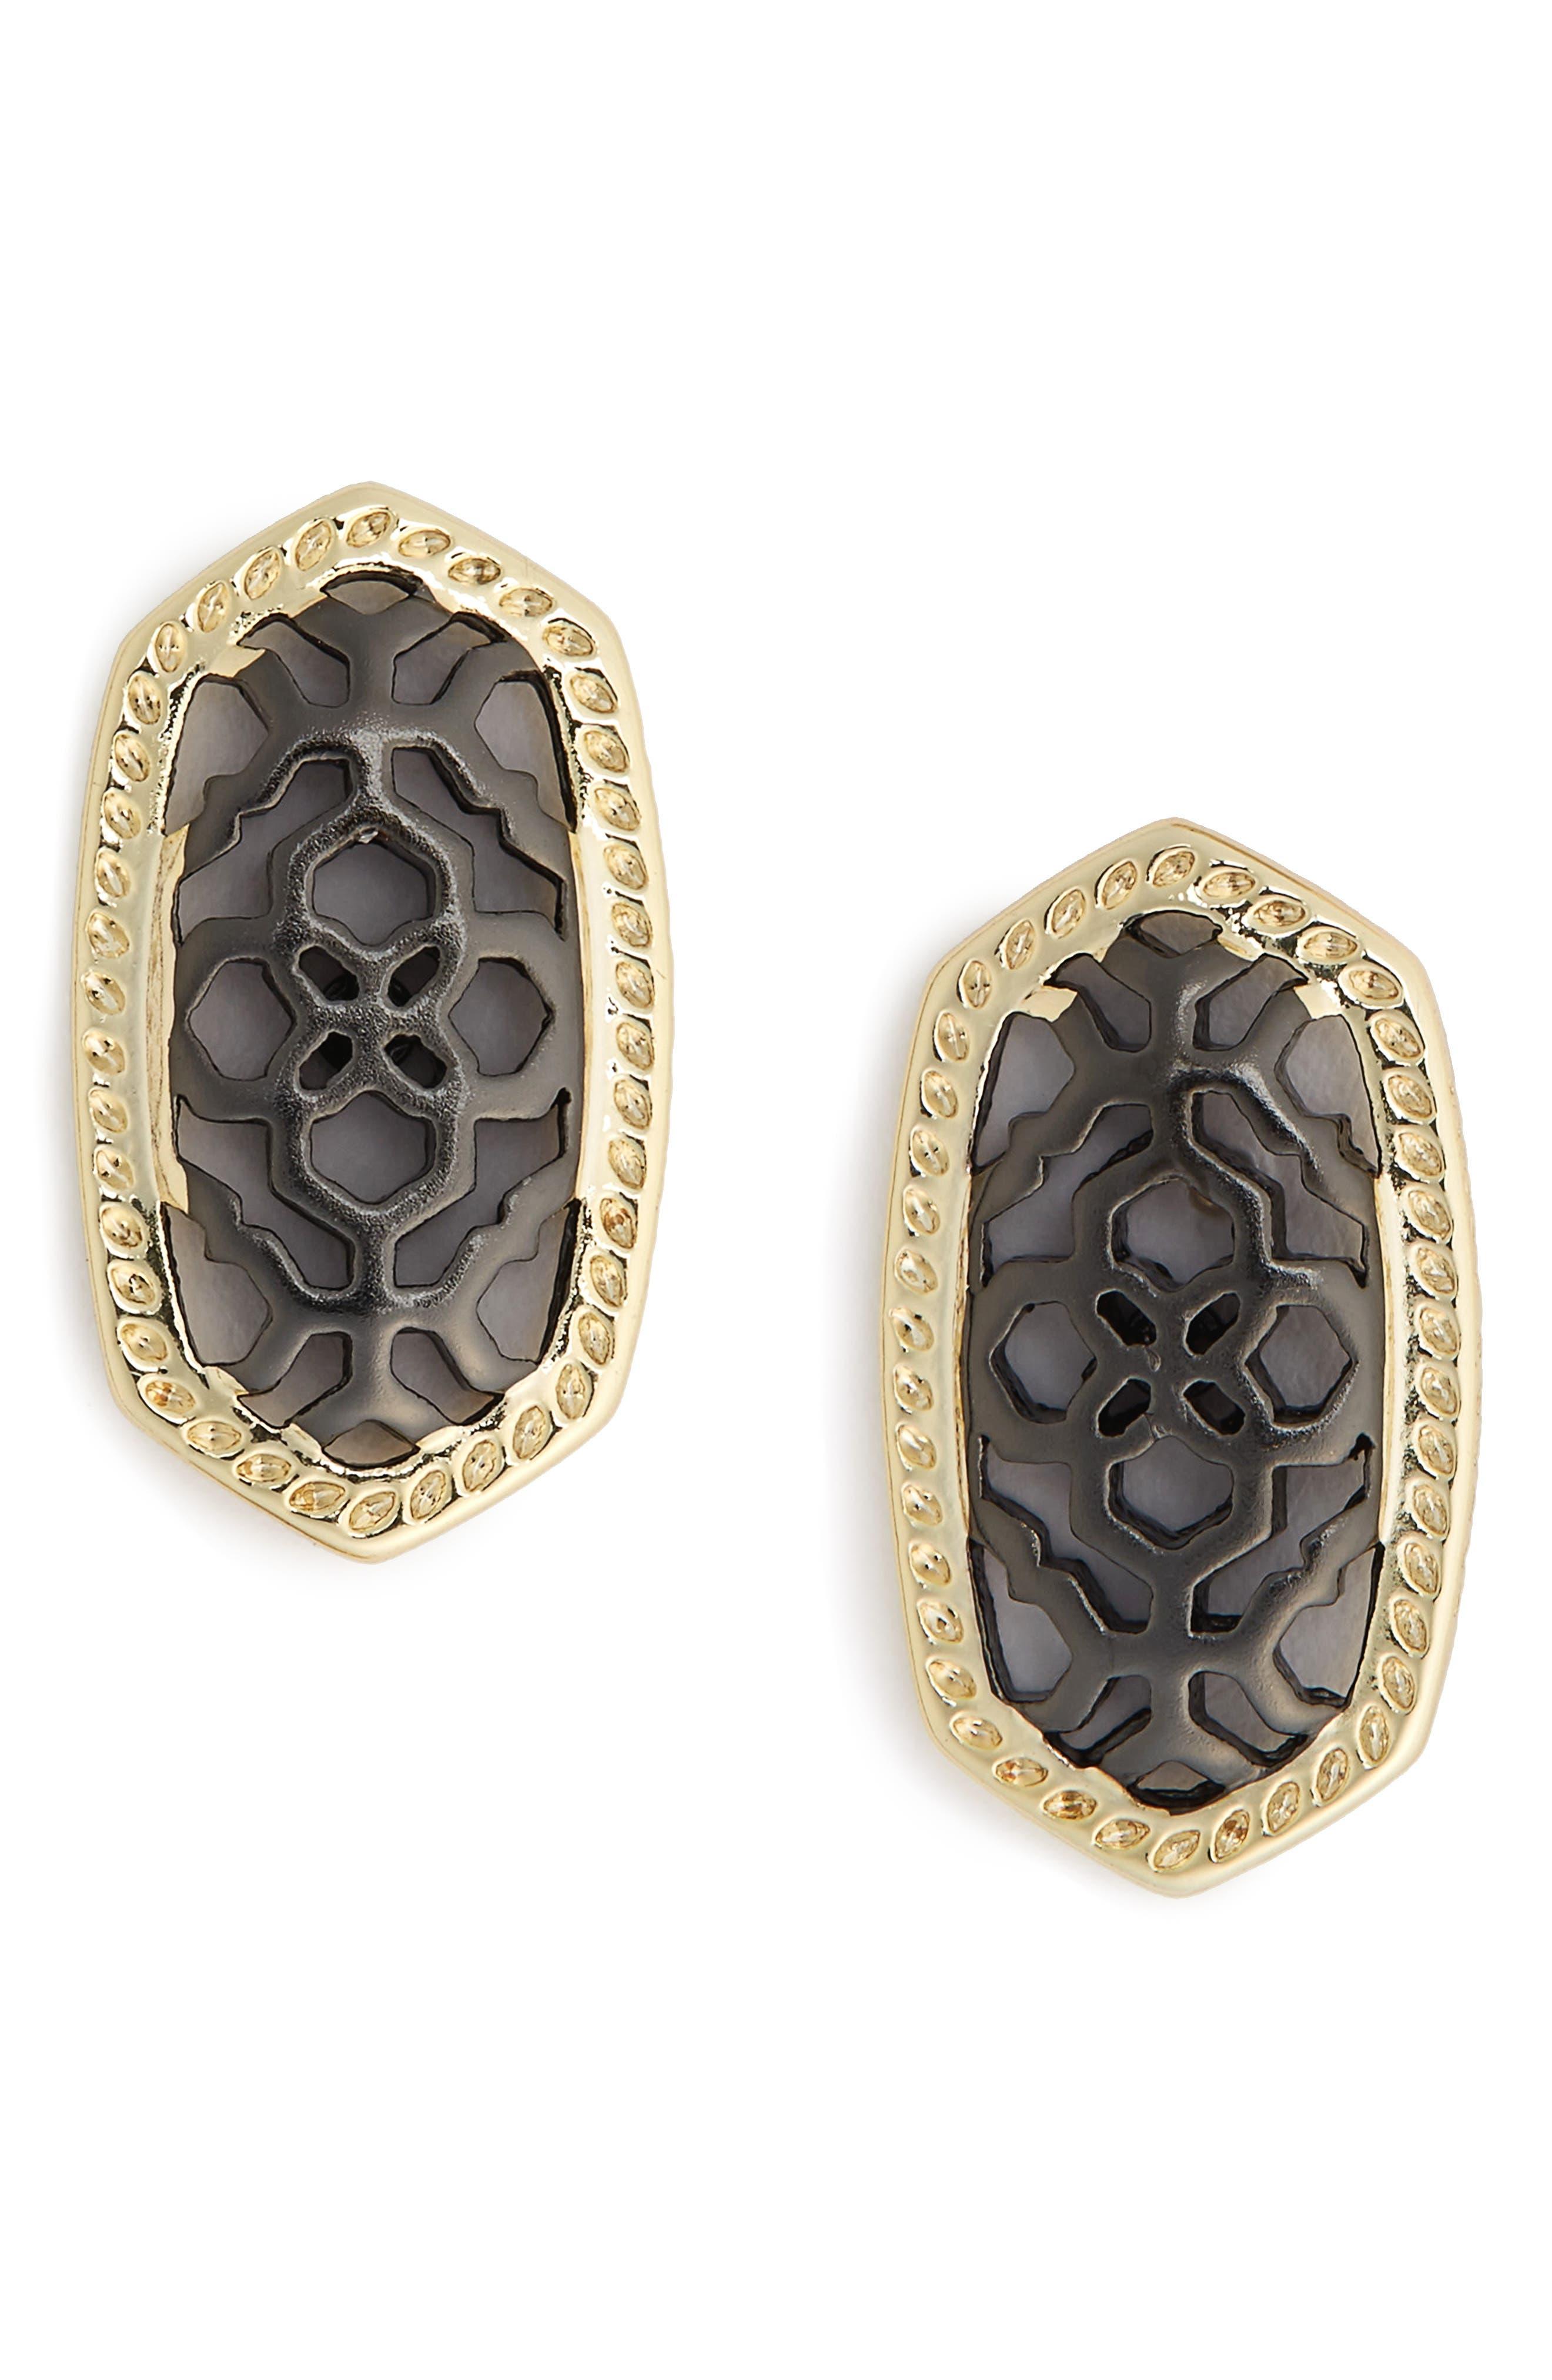 Kendra Scott 'Bryant' Drop Earrings